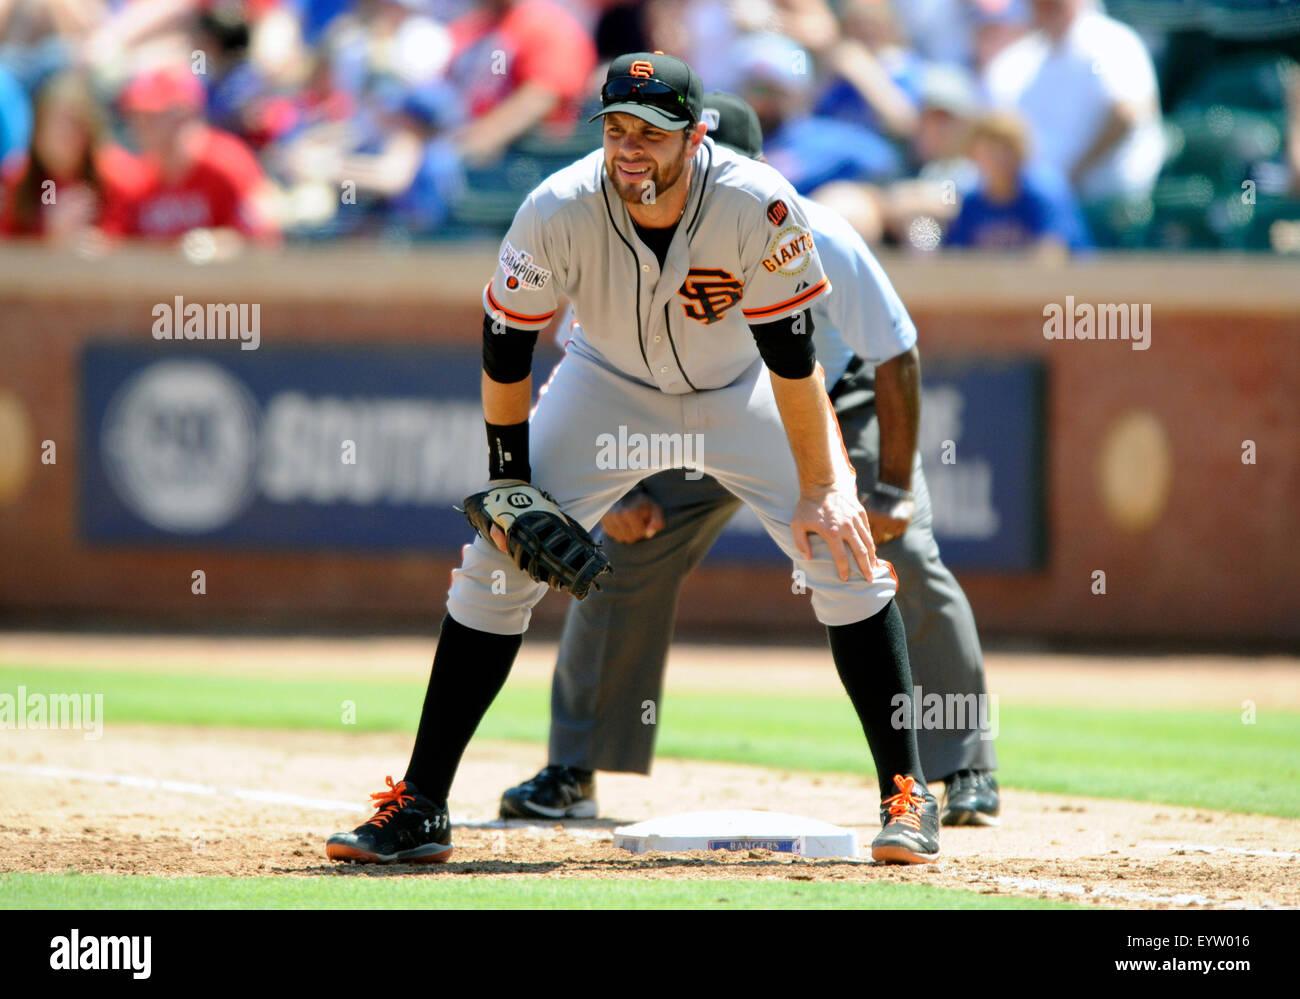 aug 02, 2015: san francisco giants first baseman brandon belt #9